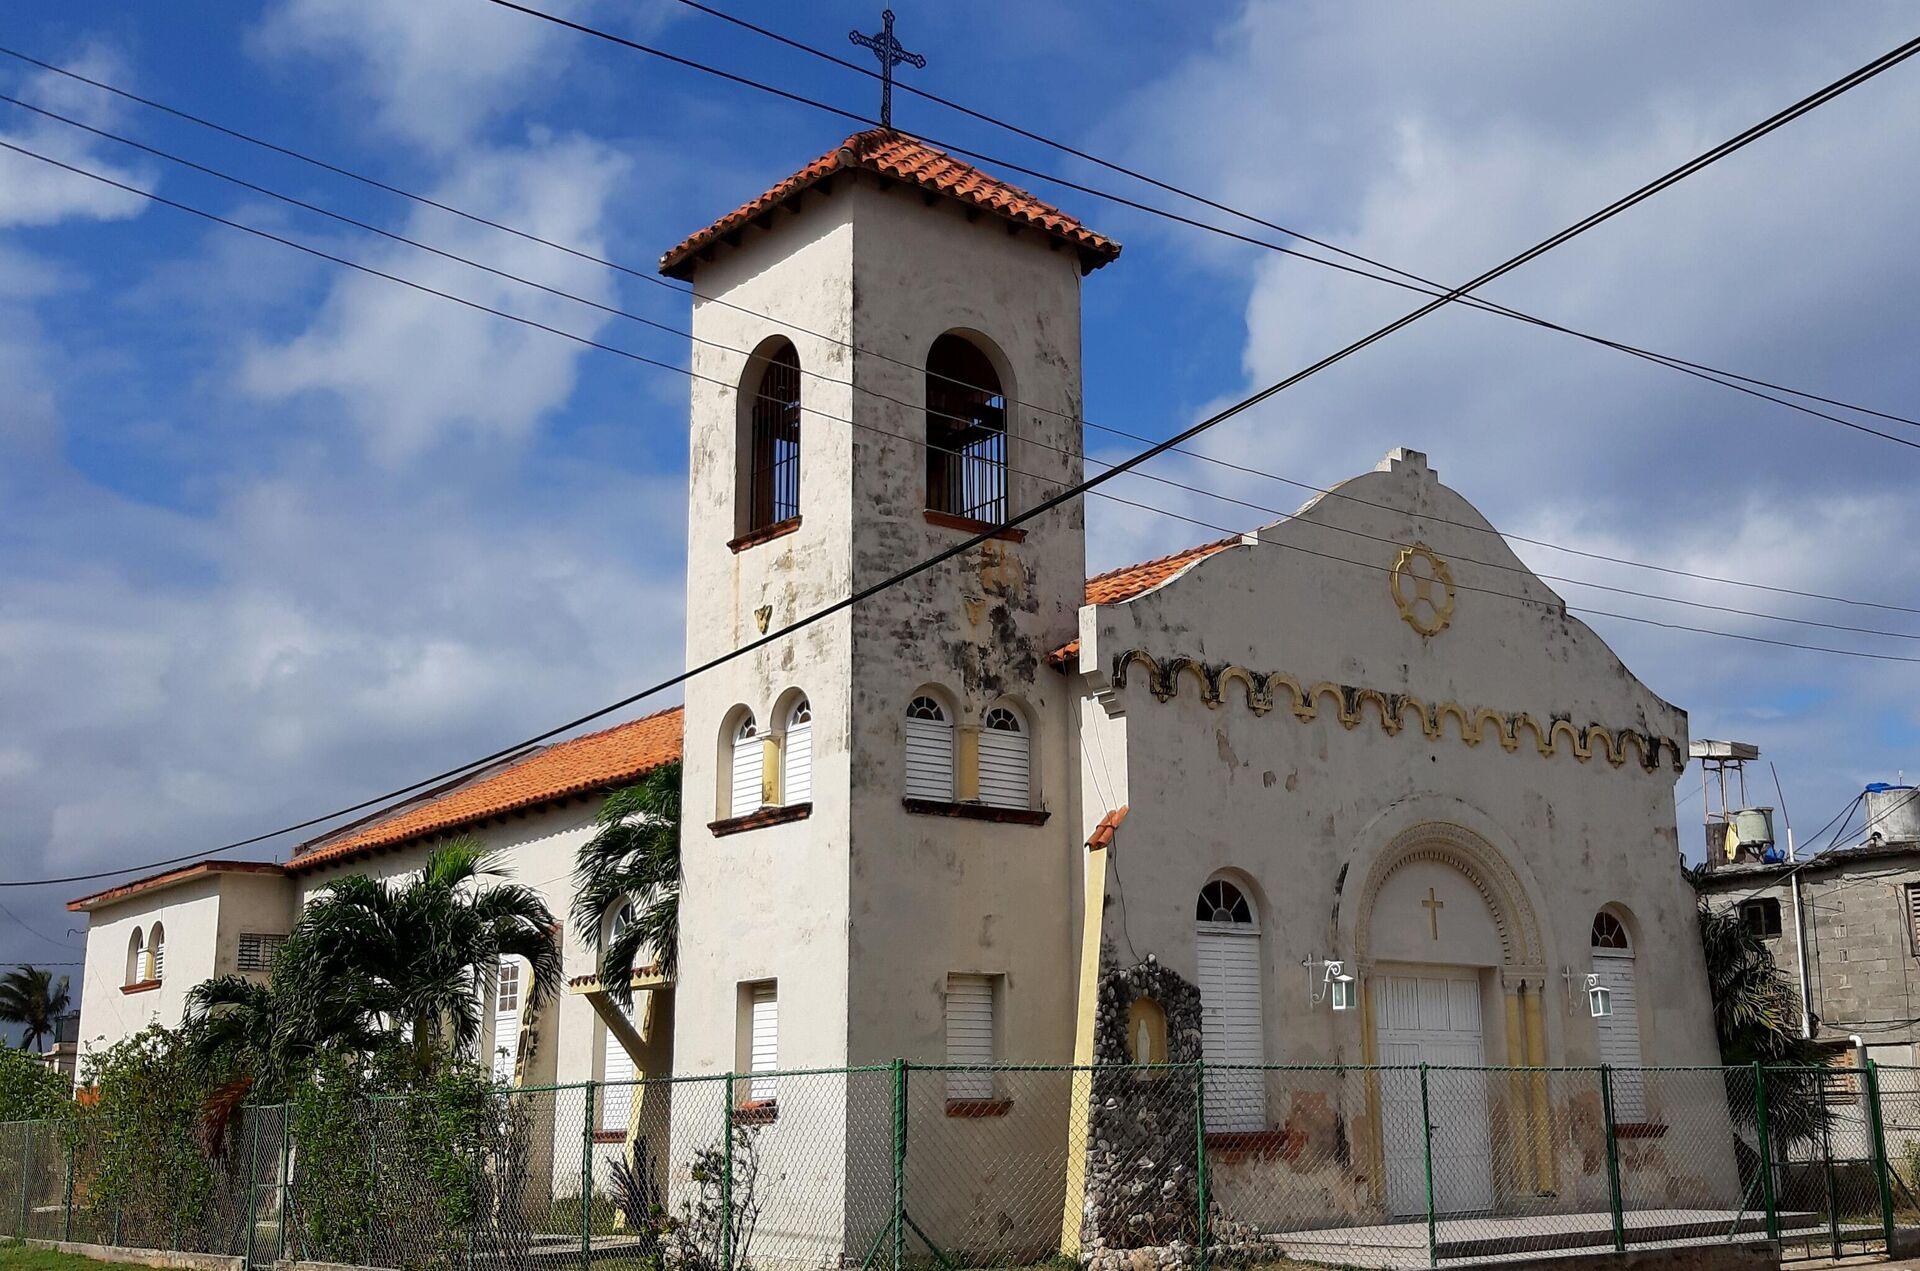 Iglesia católica en La Habana, capital de Cuba  - Sputnik Mundo, 1920, 22.02.2021